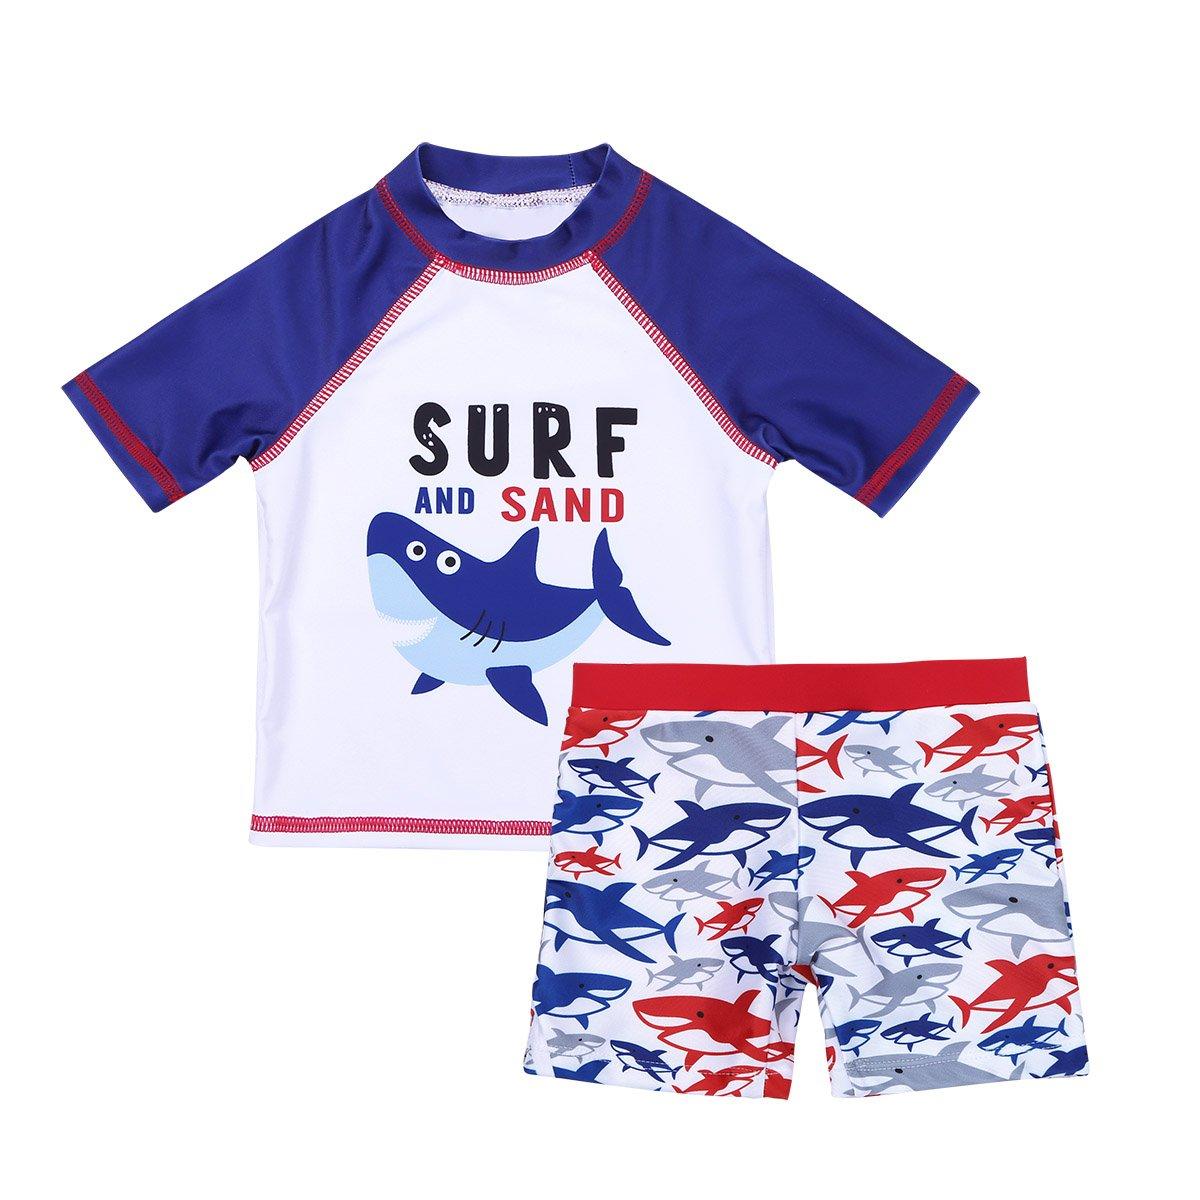 ACSUSS Toddler Baby Boys Girls 2PCS Tankini Swimwear Shark Print Shirt with Shorts Rash Guard Set